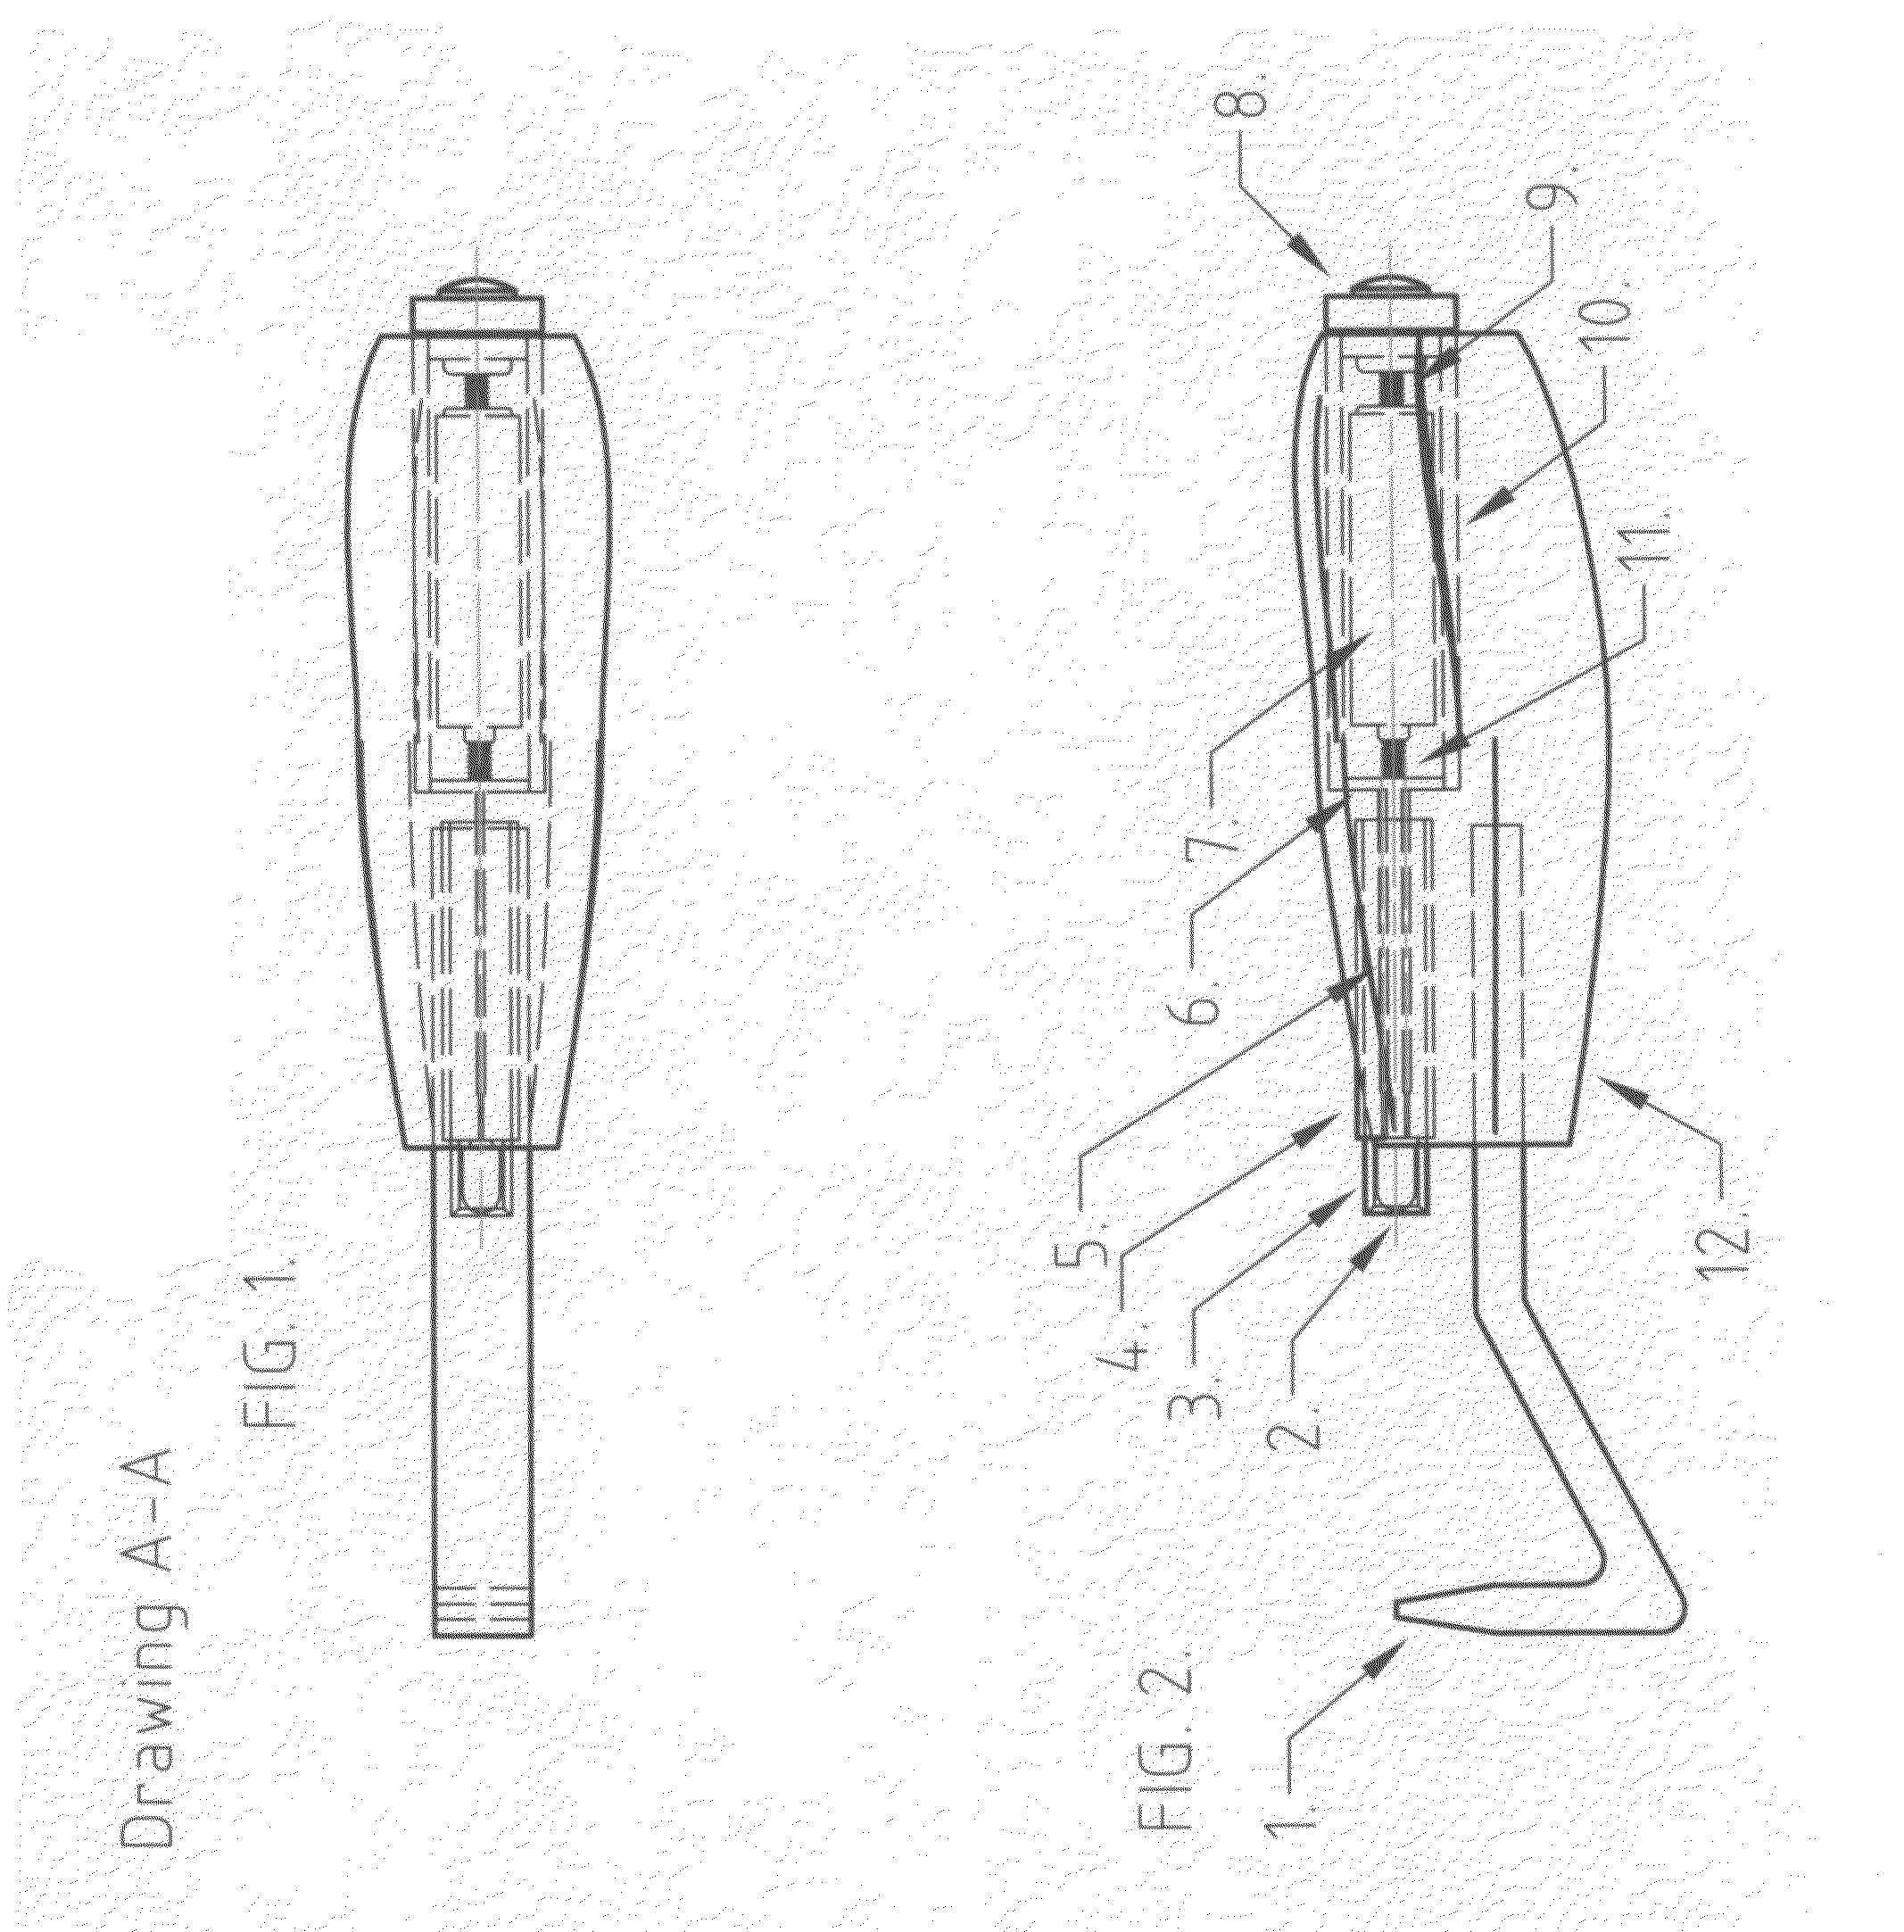 patent us20120199369 - illuminating hoof-pick